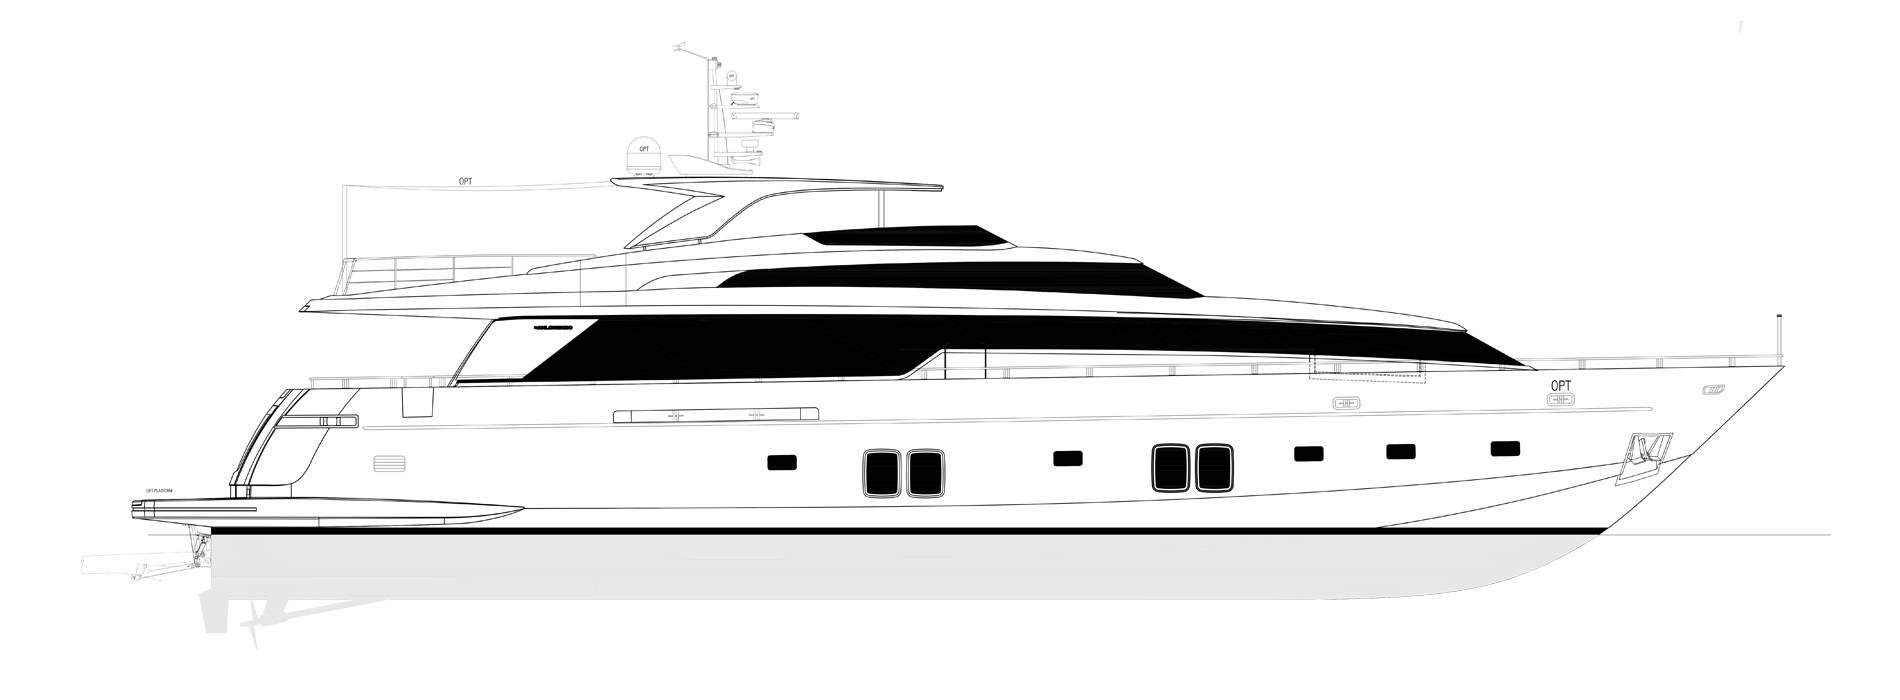 Sanlorenzo Yachts SL106-725 Profilo